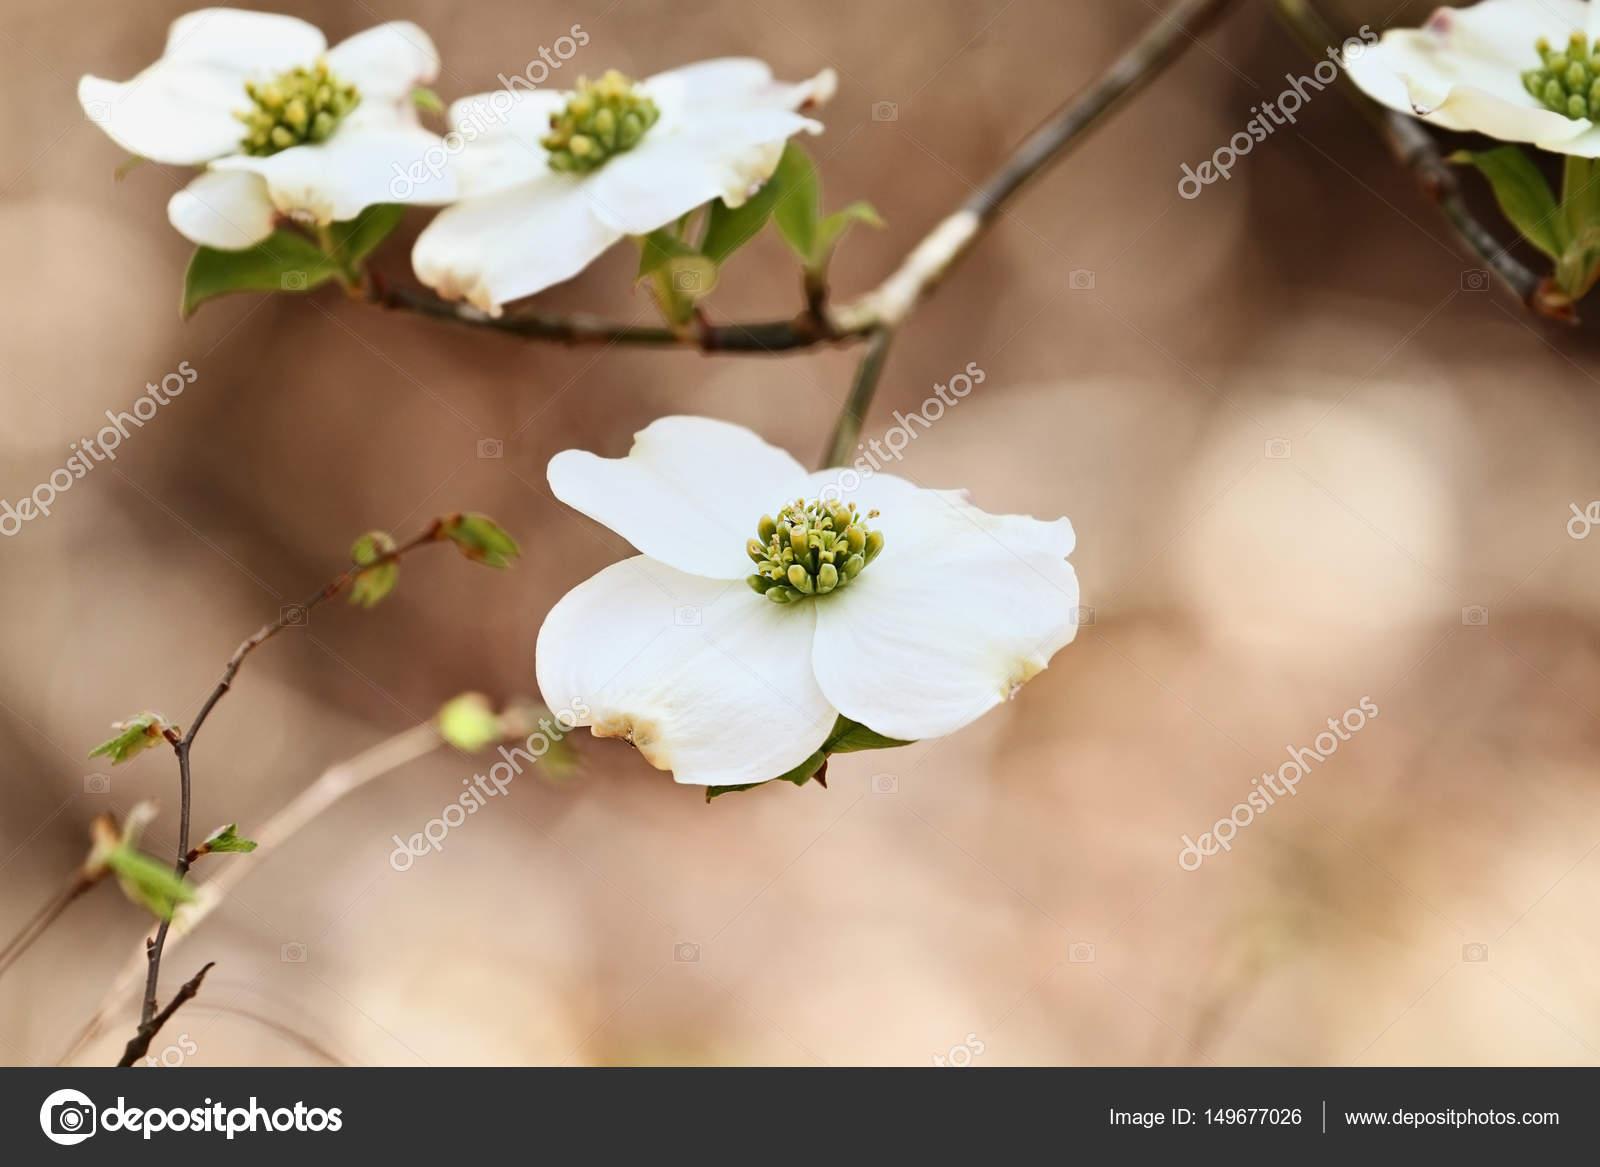 Beautiful White Flowering Dogwood Blossoms Stock Photo